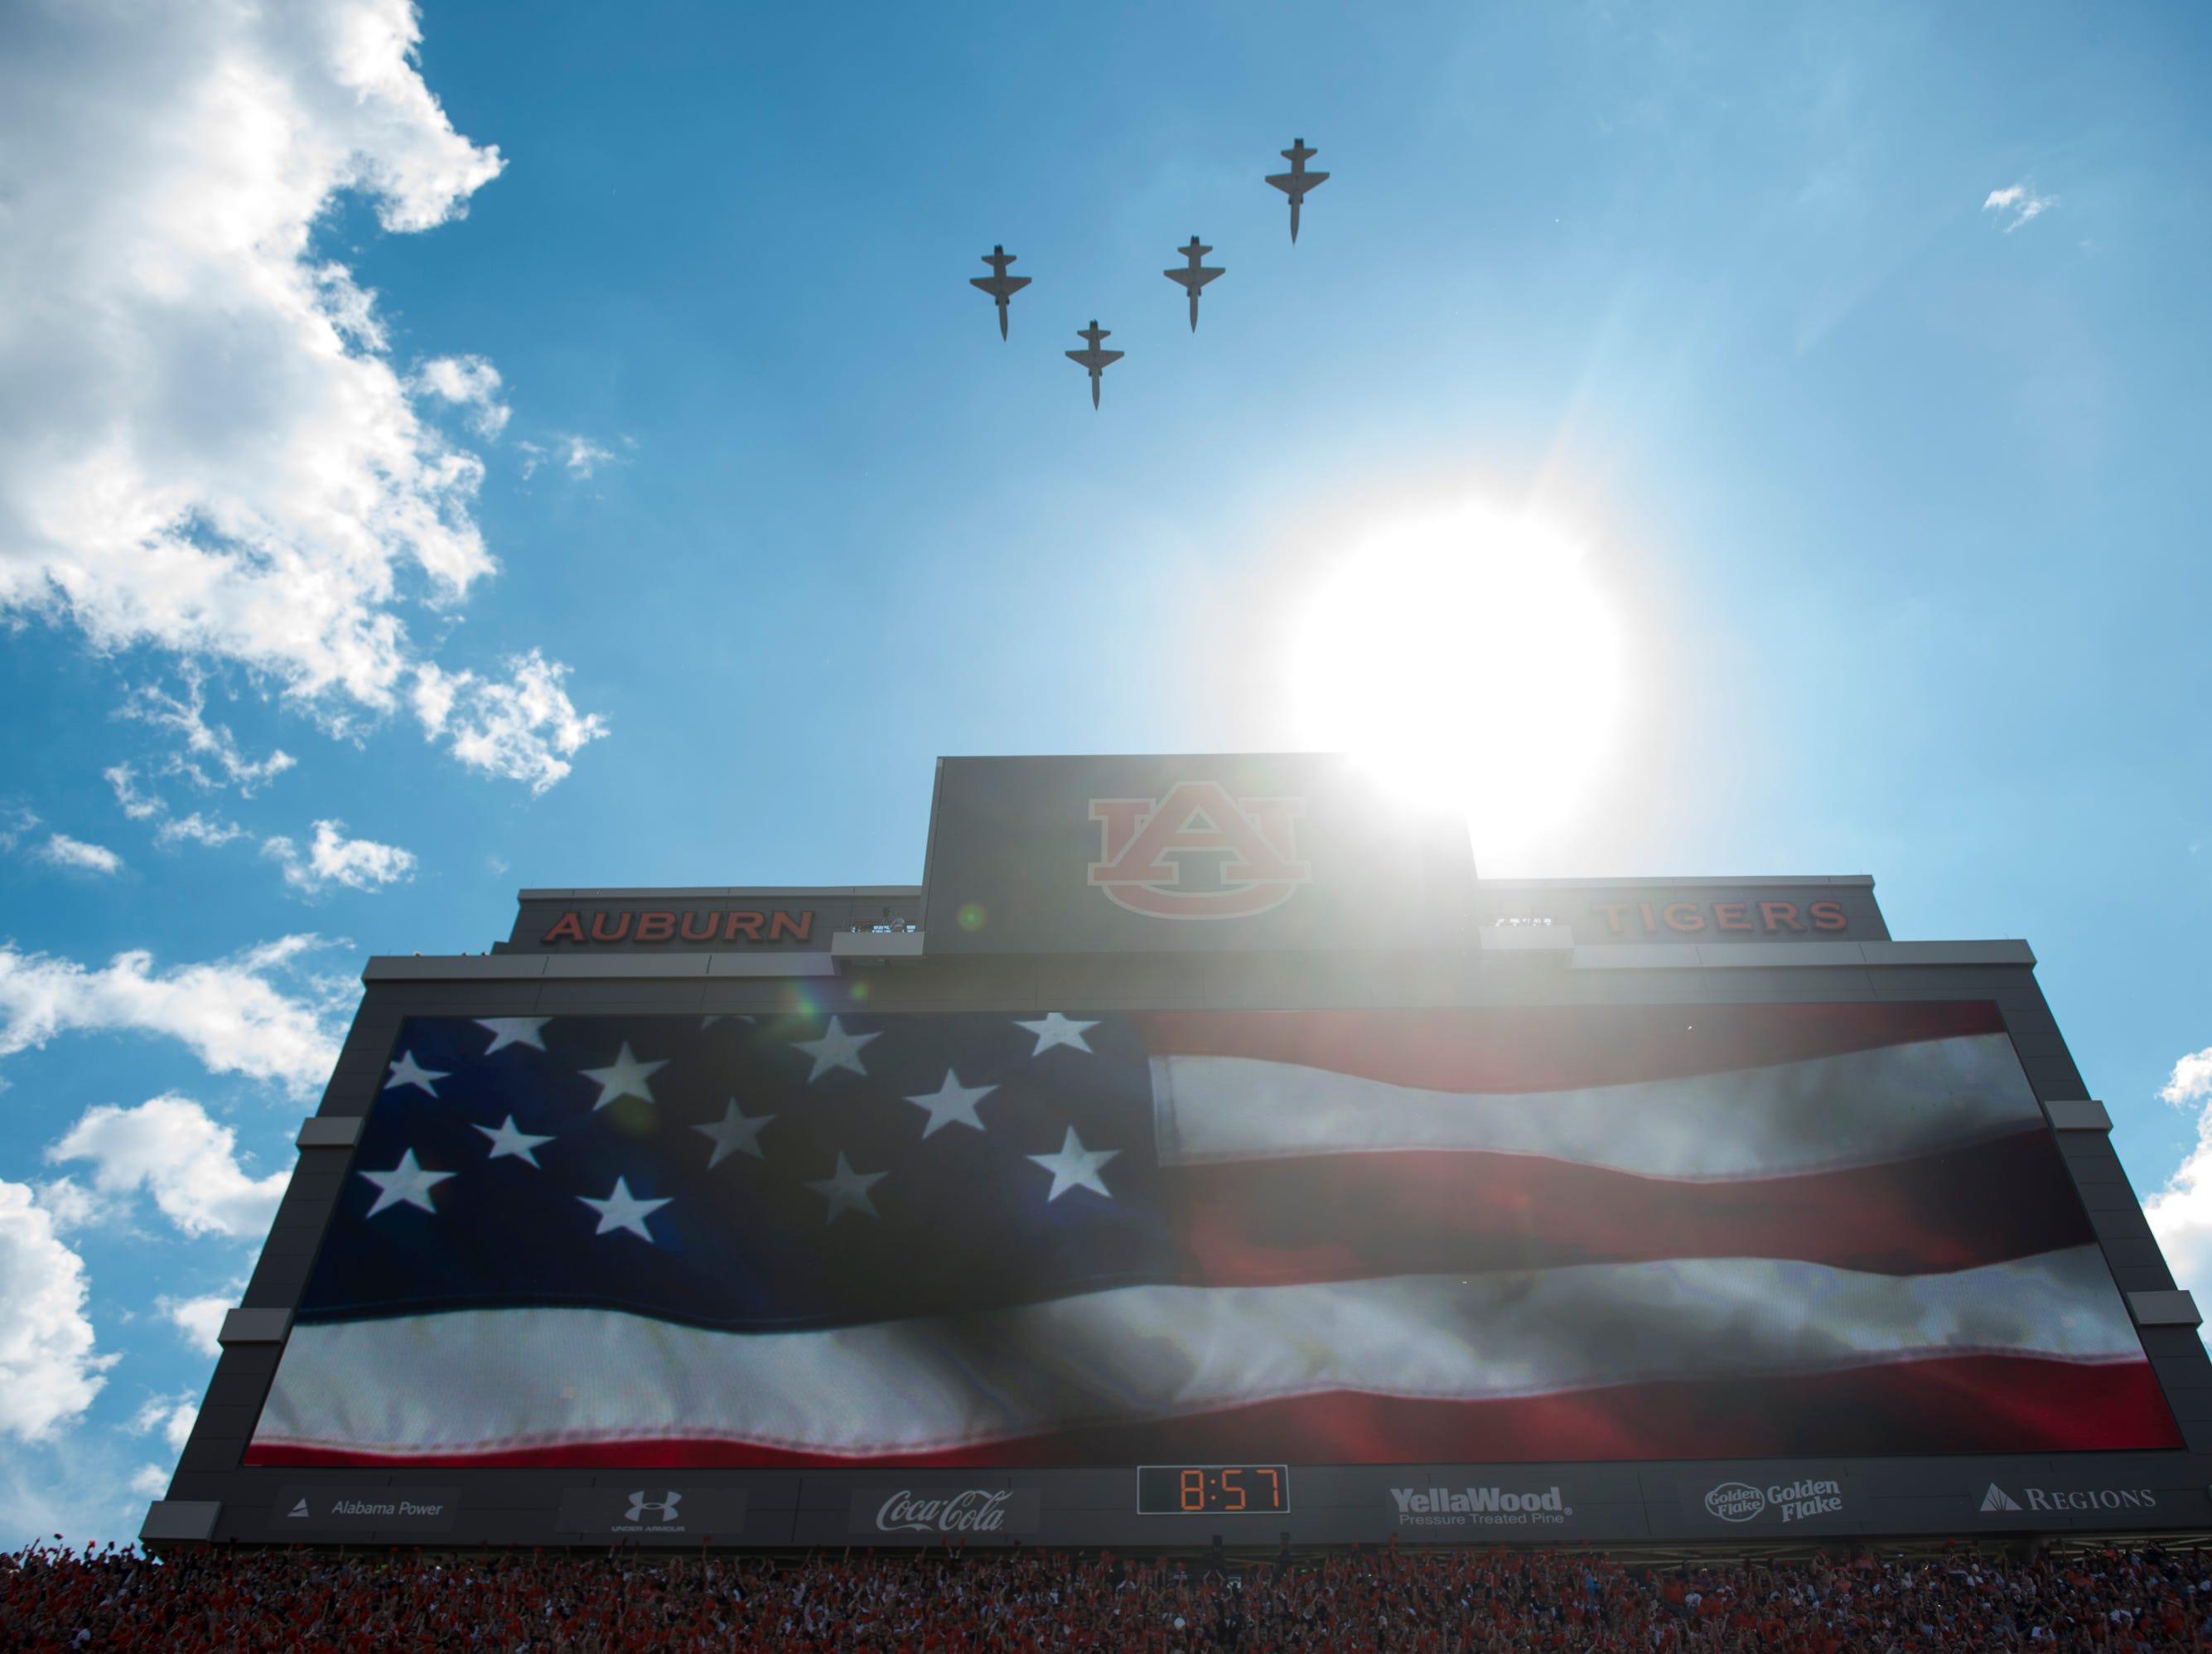 Jets fly over the stadium before Auburn takes on LSU at Jordan-Hare Stadium in Auburn, Ala., on Saturday, Sept. 15, 2018. LSU defeated Auburn 22-21.